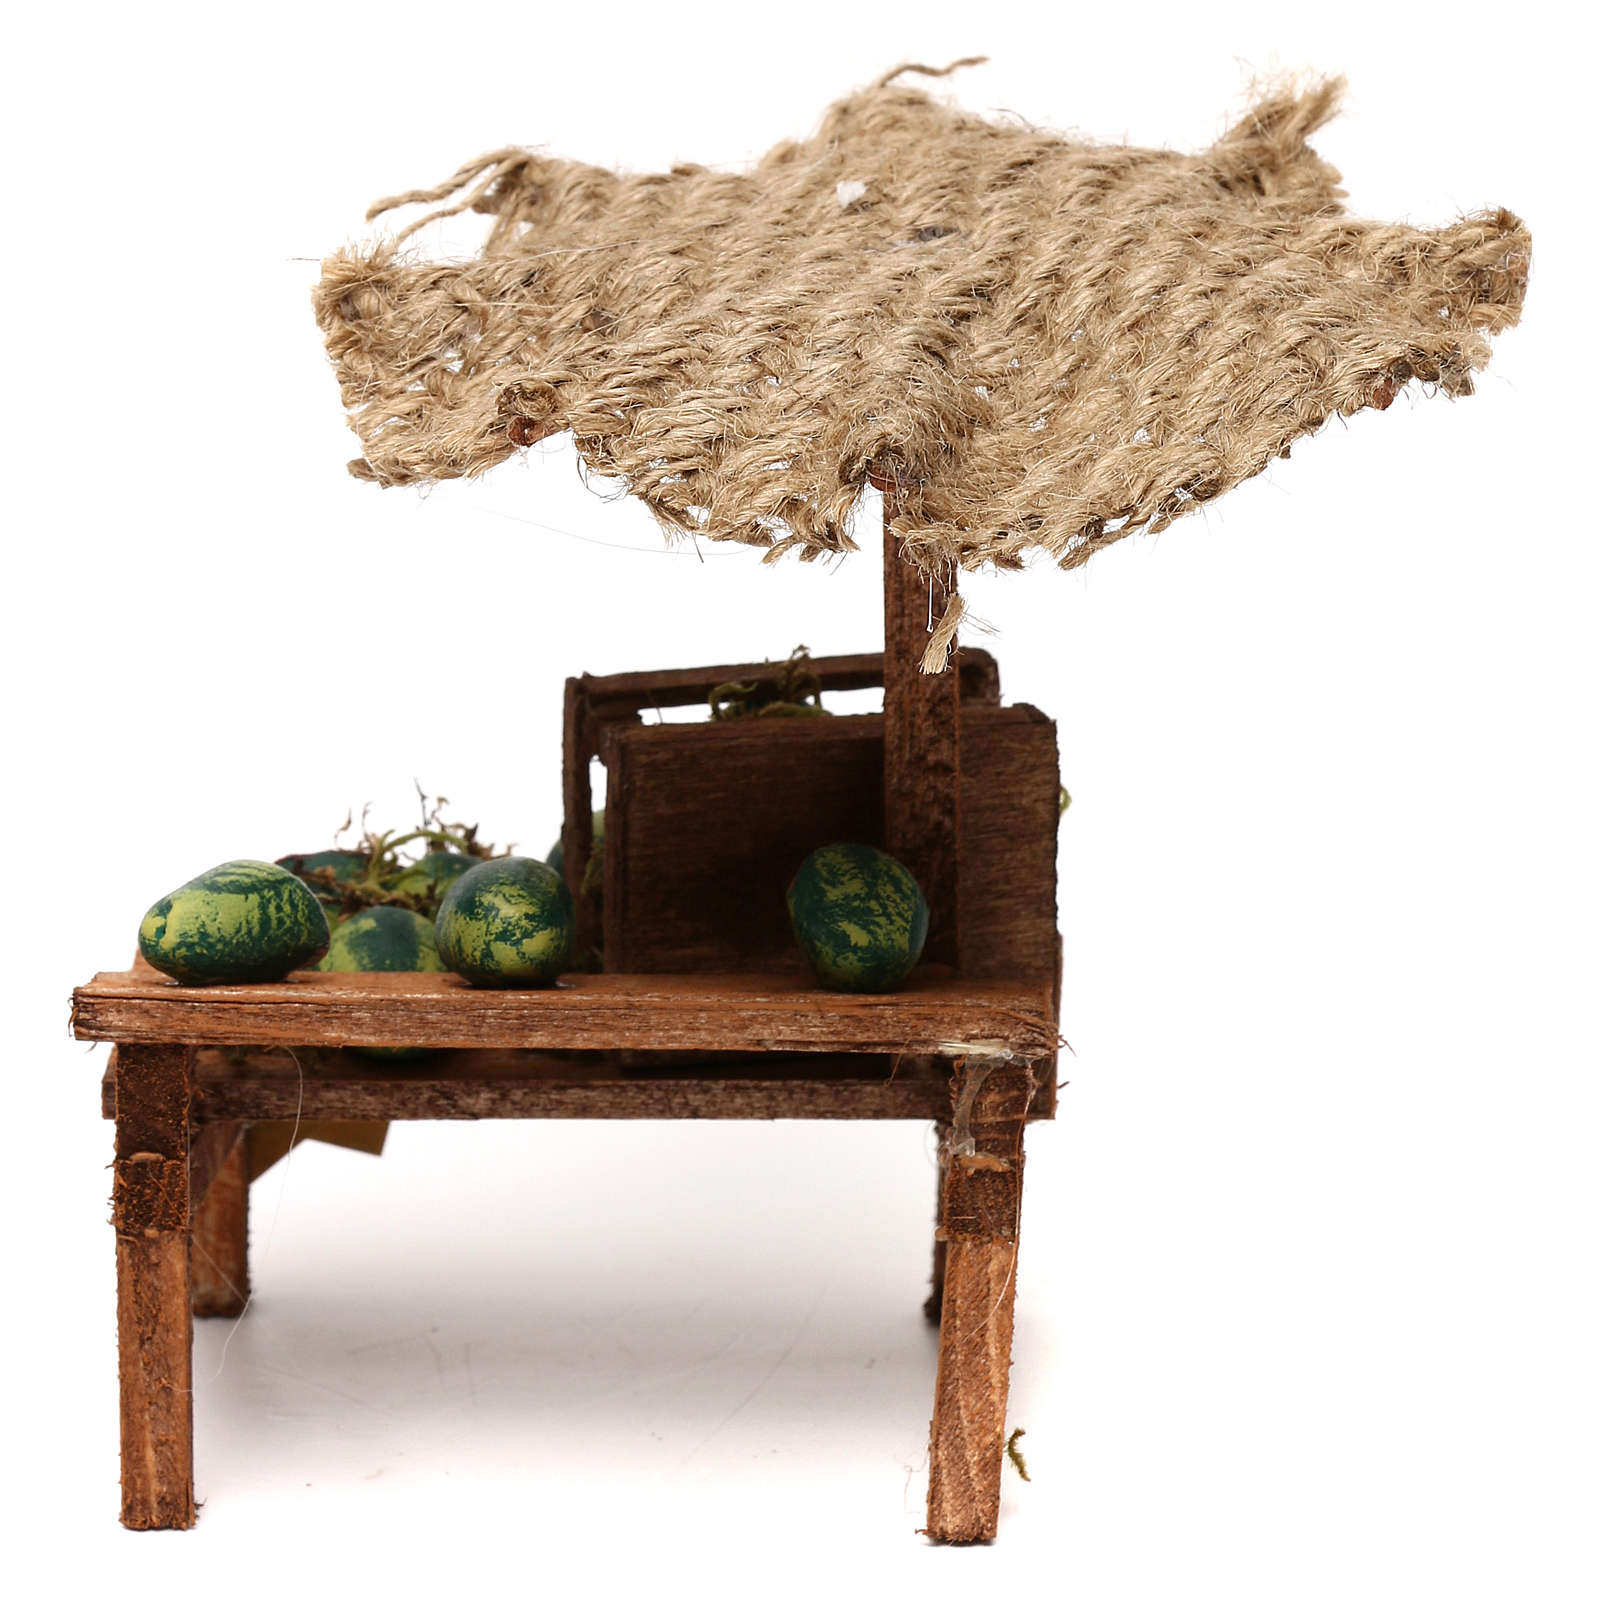 Workshop nativity with beach umbrella, watermelons 12x10x12cm 4